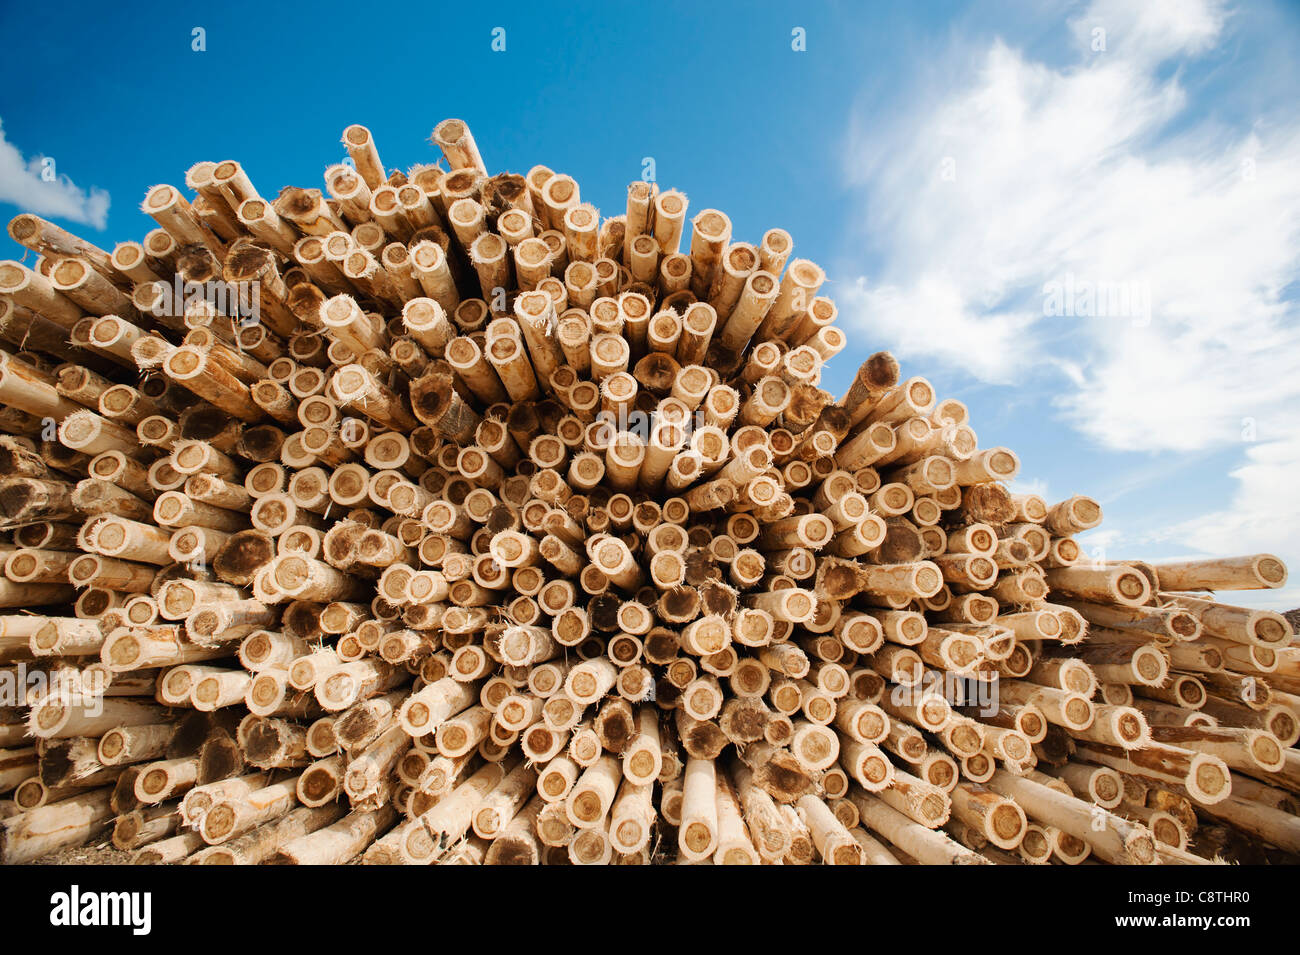 USA, Oregon, Boardman, Stapel von Holz gegen blauen Himmel Stockbild